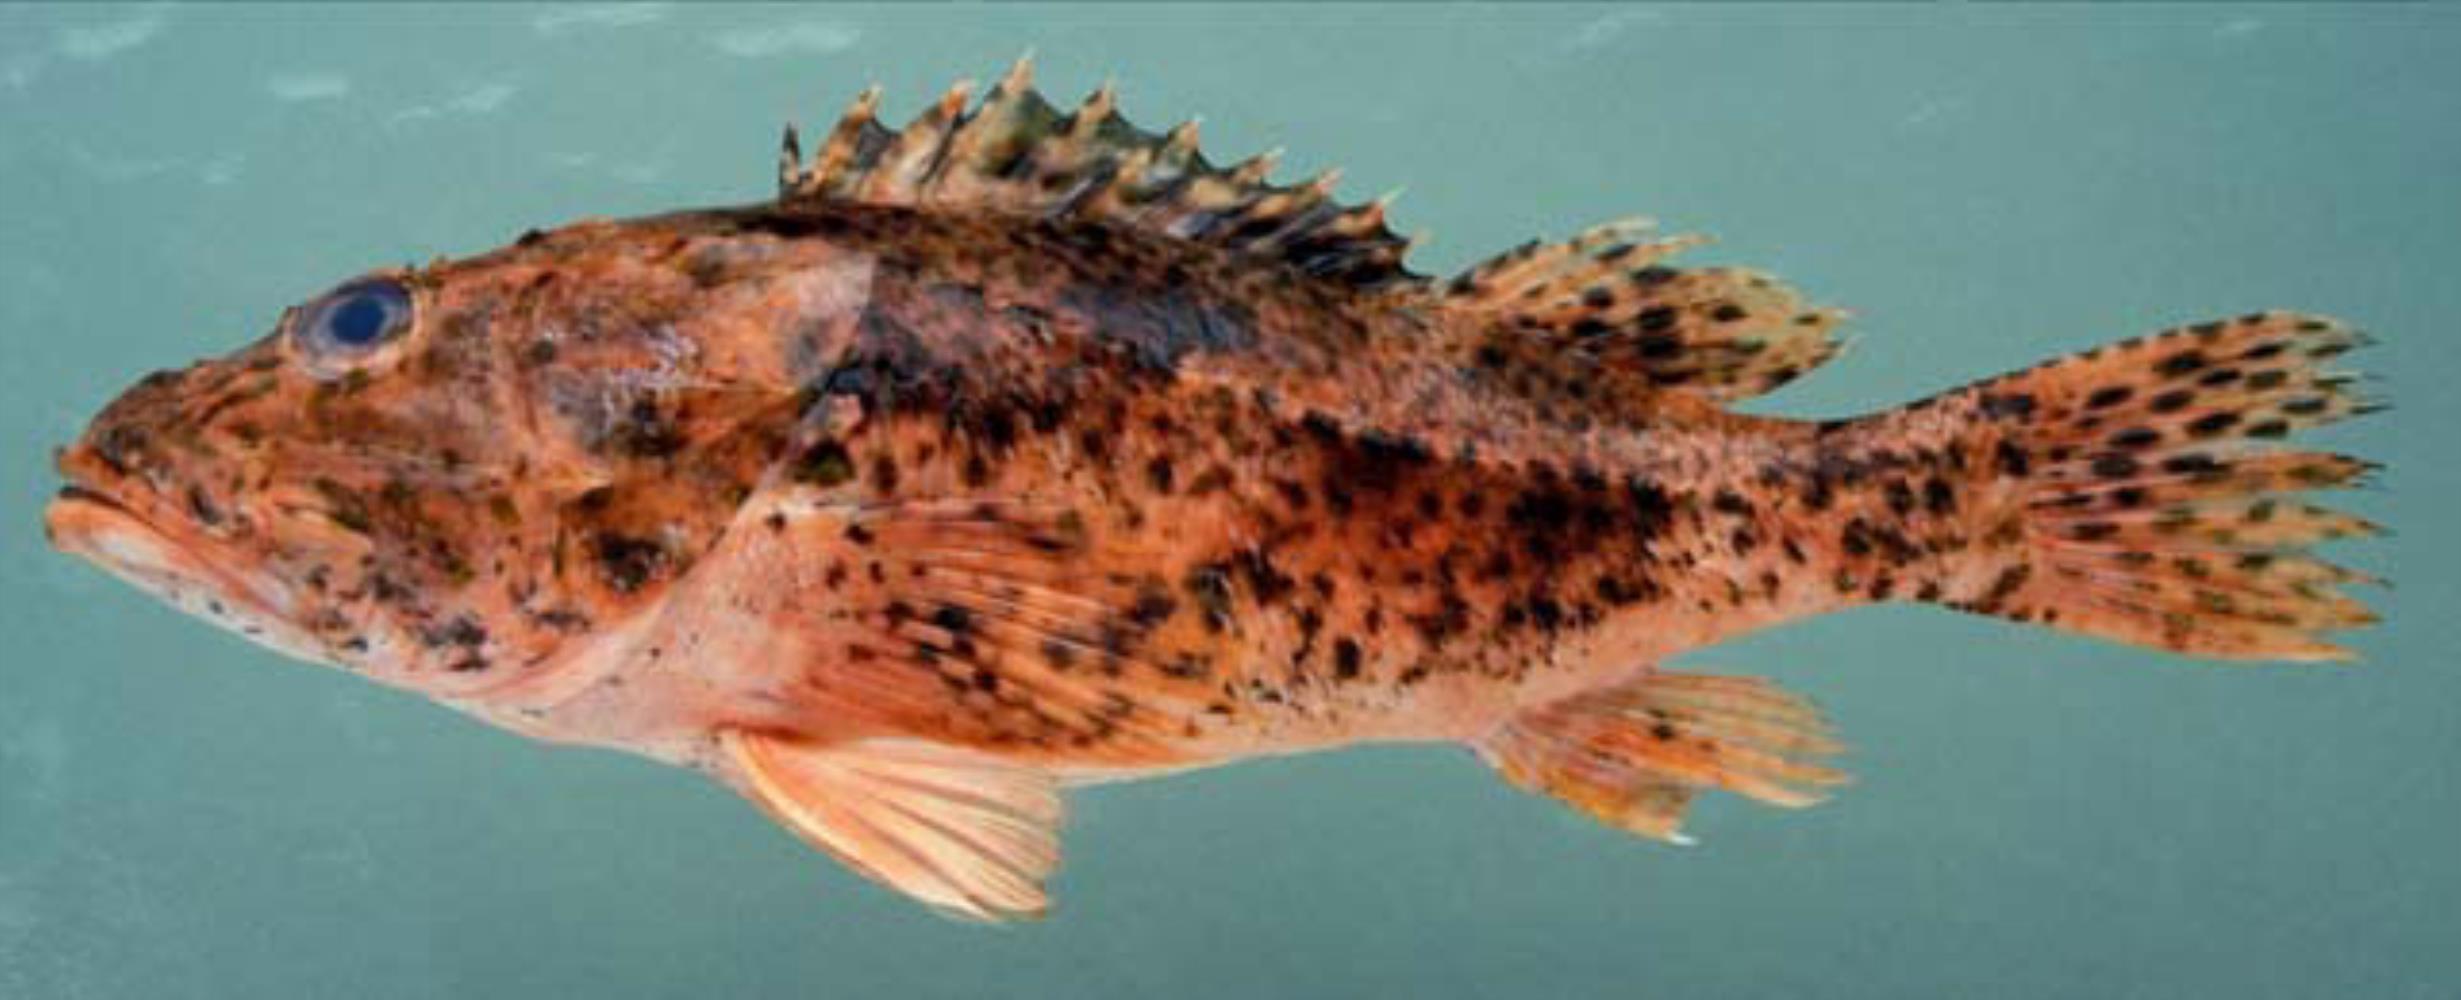 Spinycheek Scorpionfish